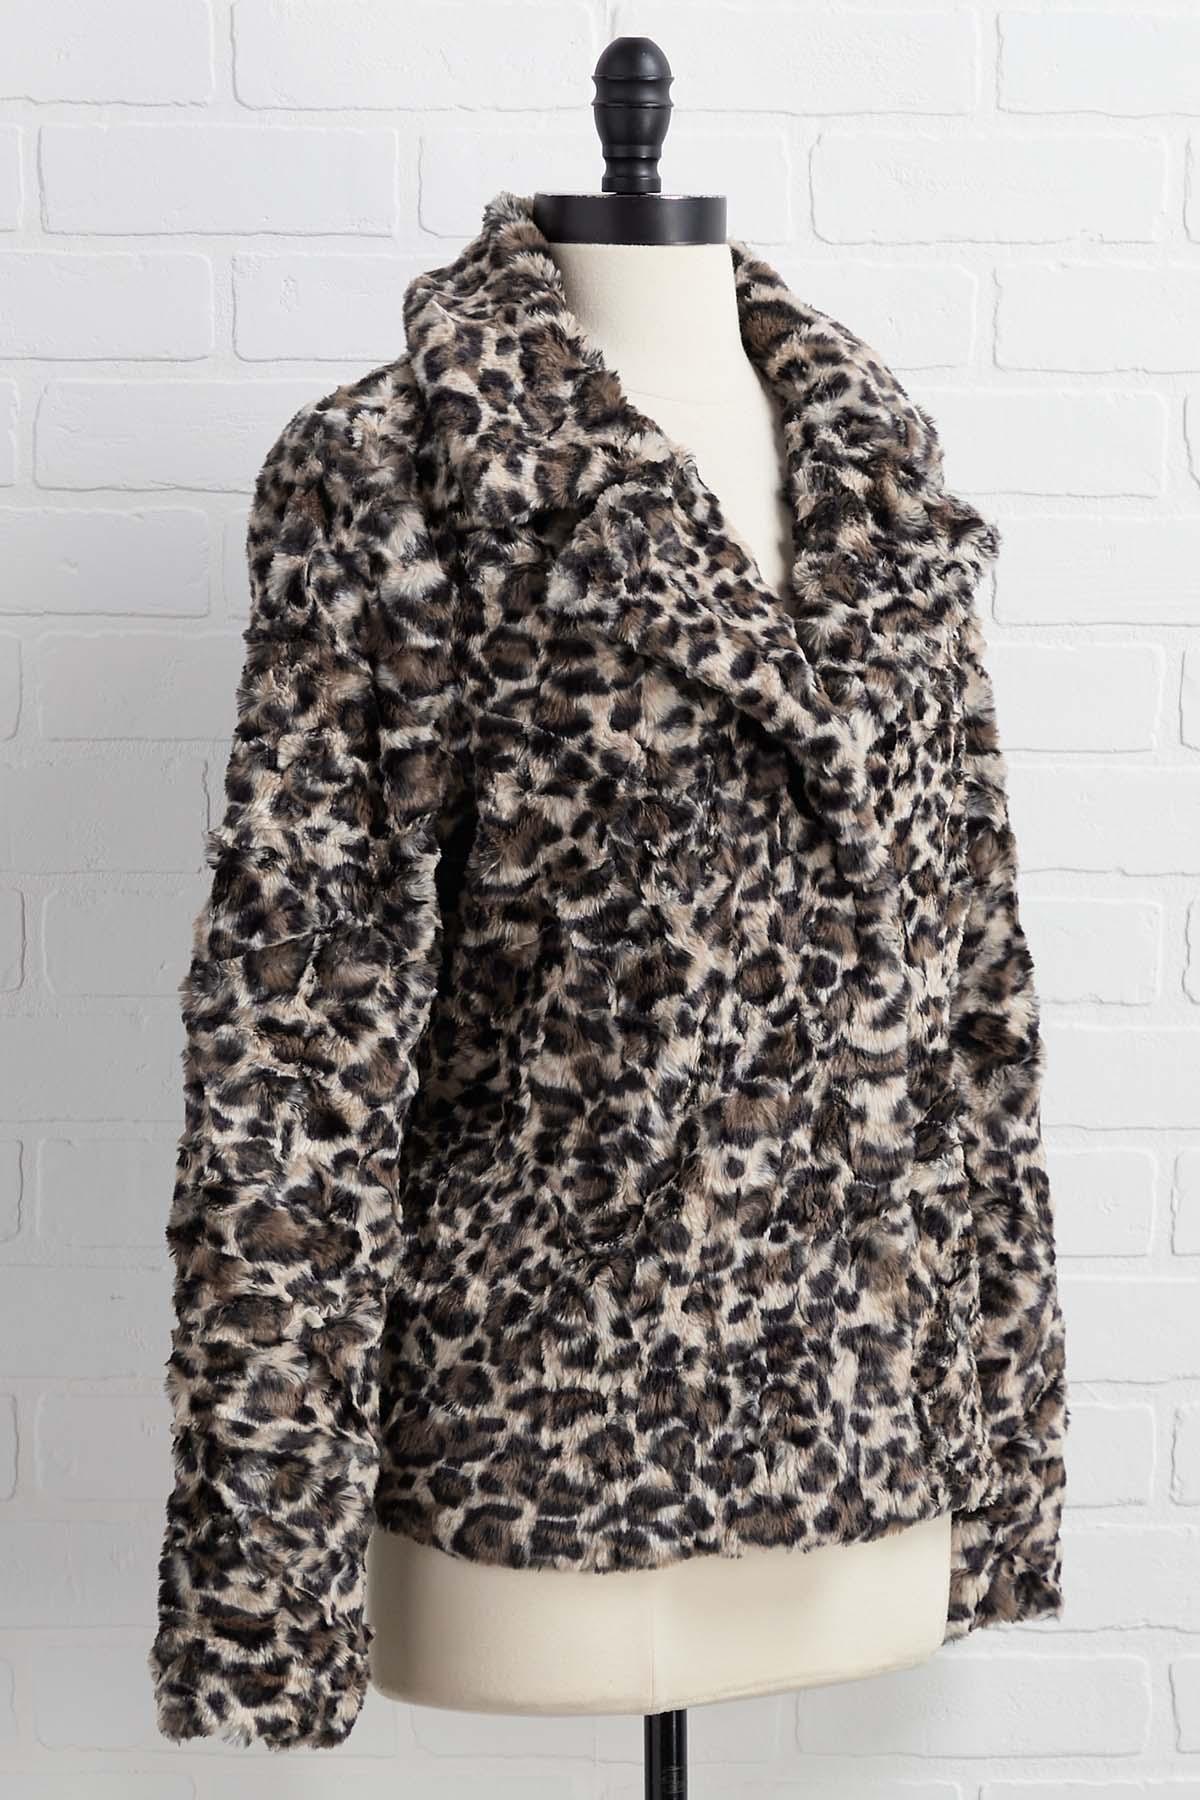 Feline Fabulous Coat